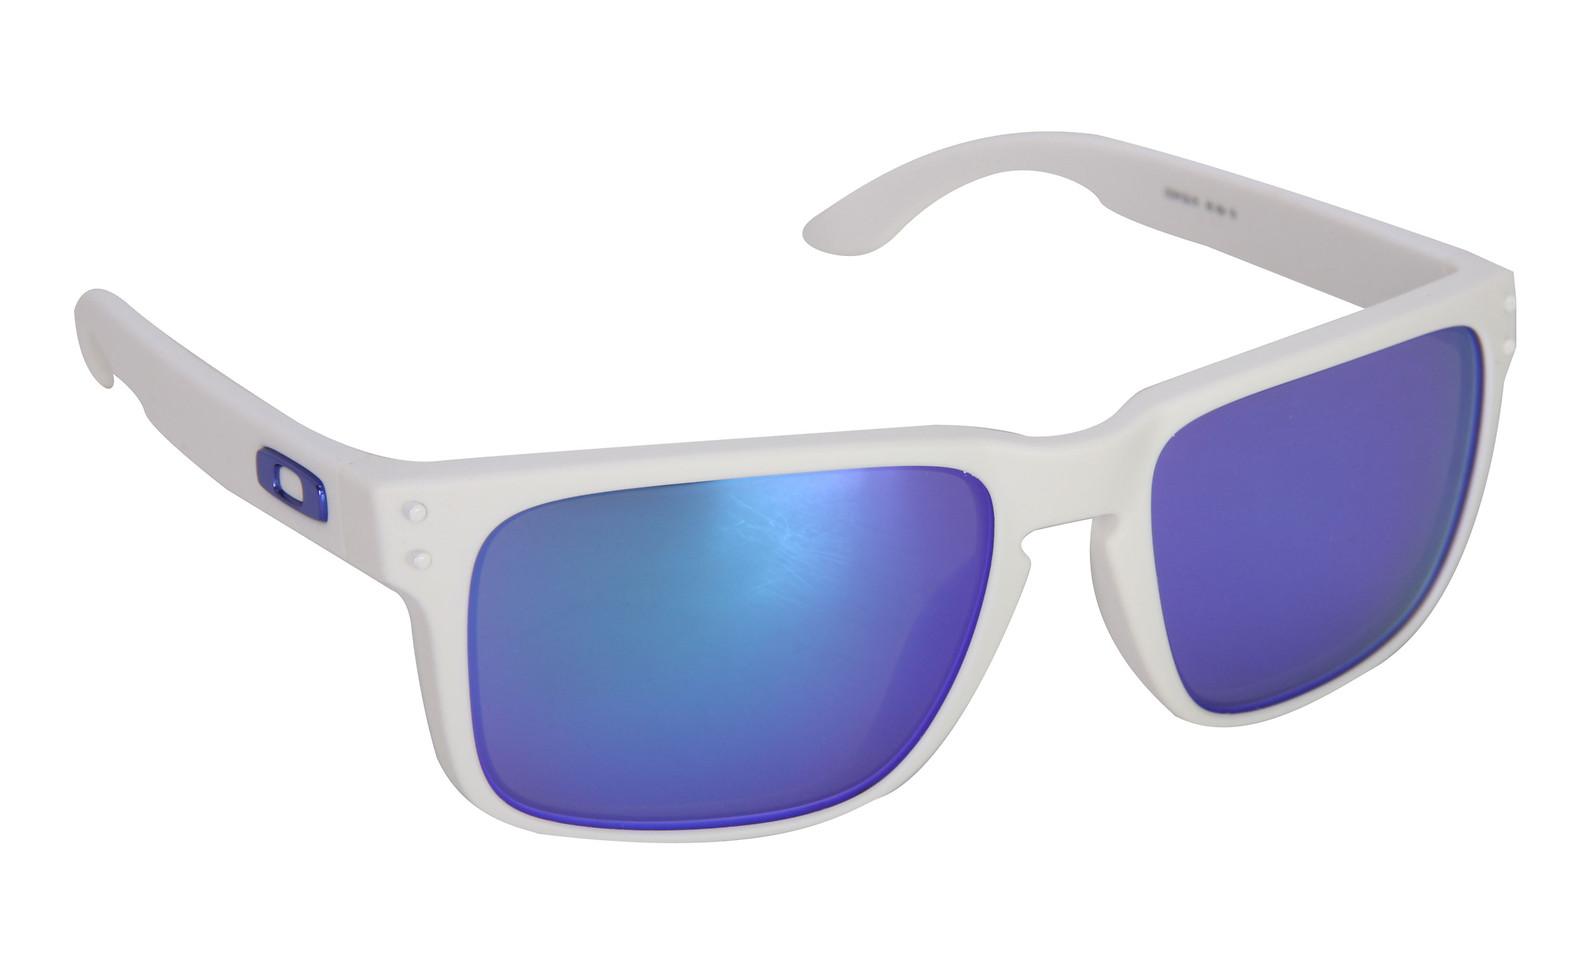 black oakley holbrook sunglasses ay24  Oakley Holbrook Sunglasses Matte White/Violet Iridium Lens oakley-holbrook -sngls-mattwhtvioletirid